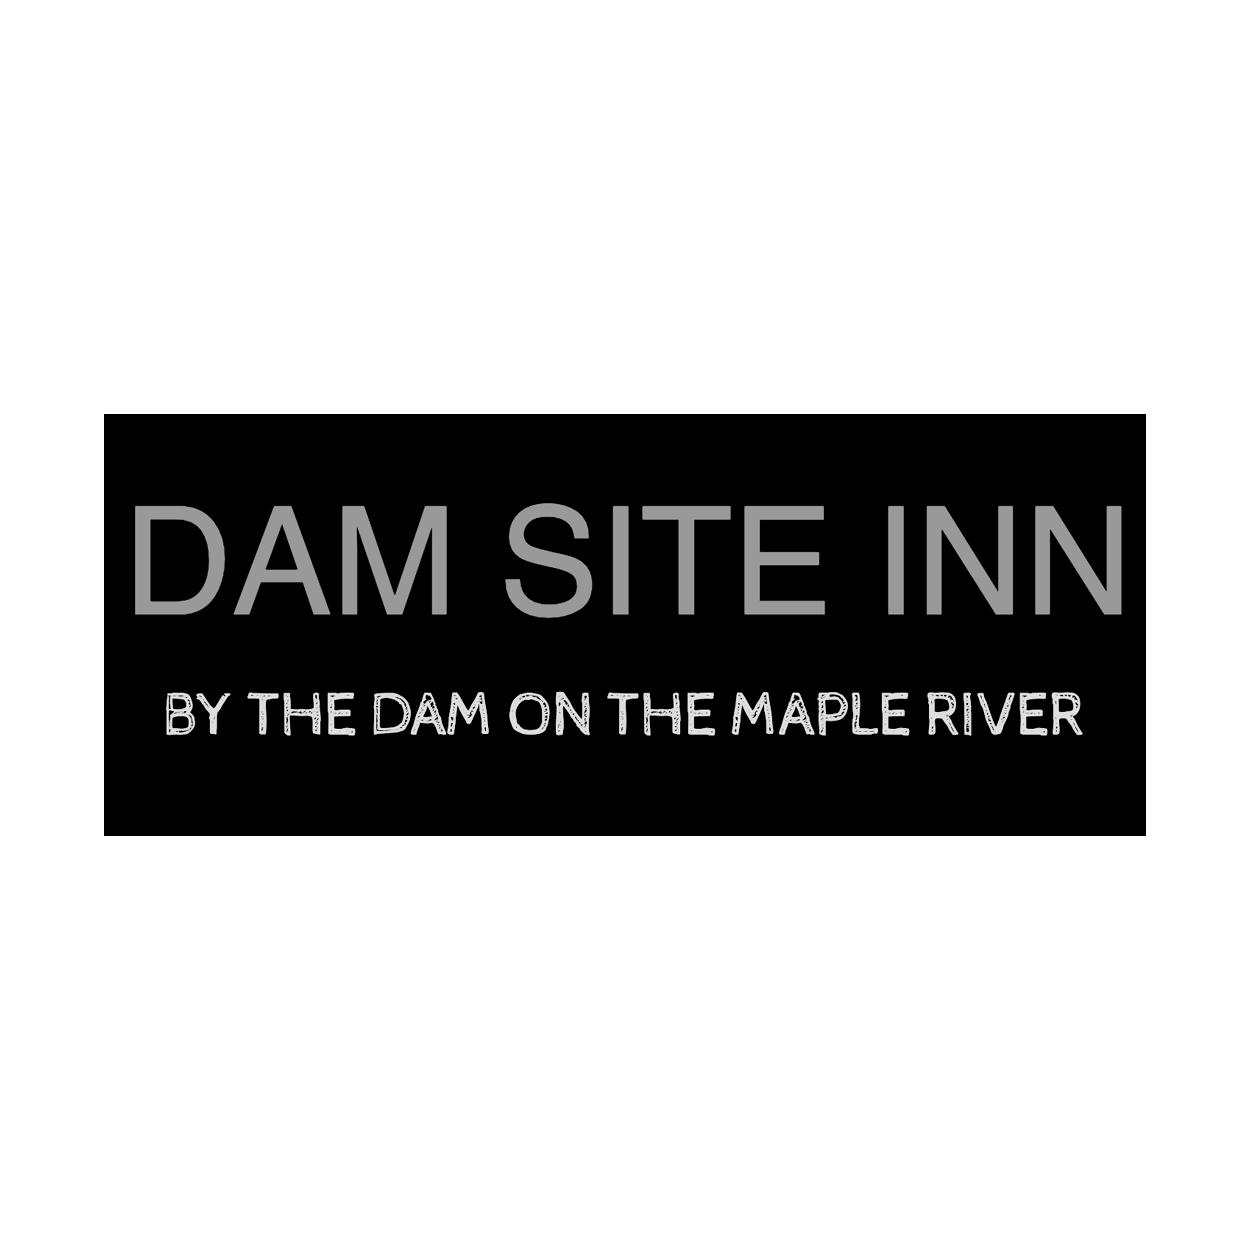 DamSiteInn